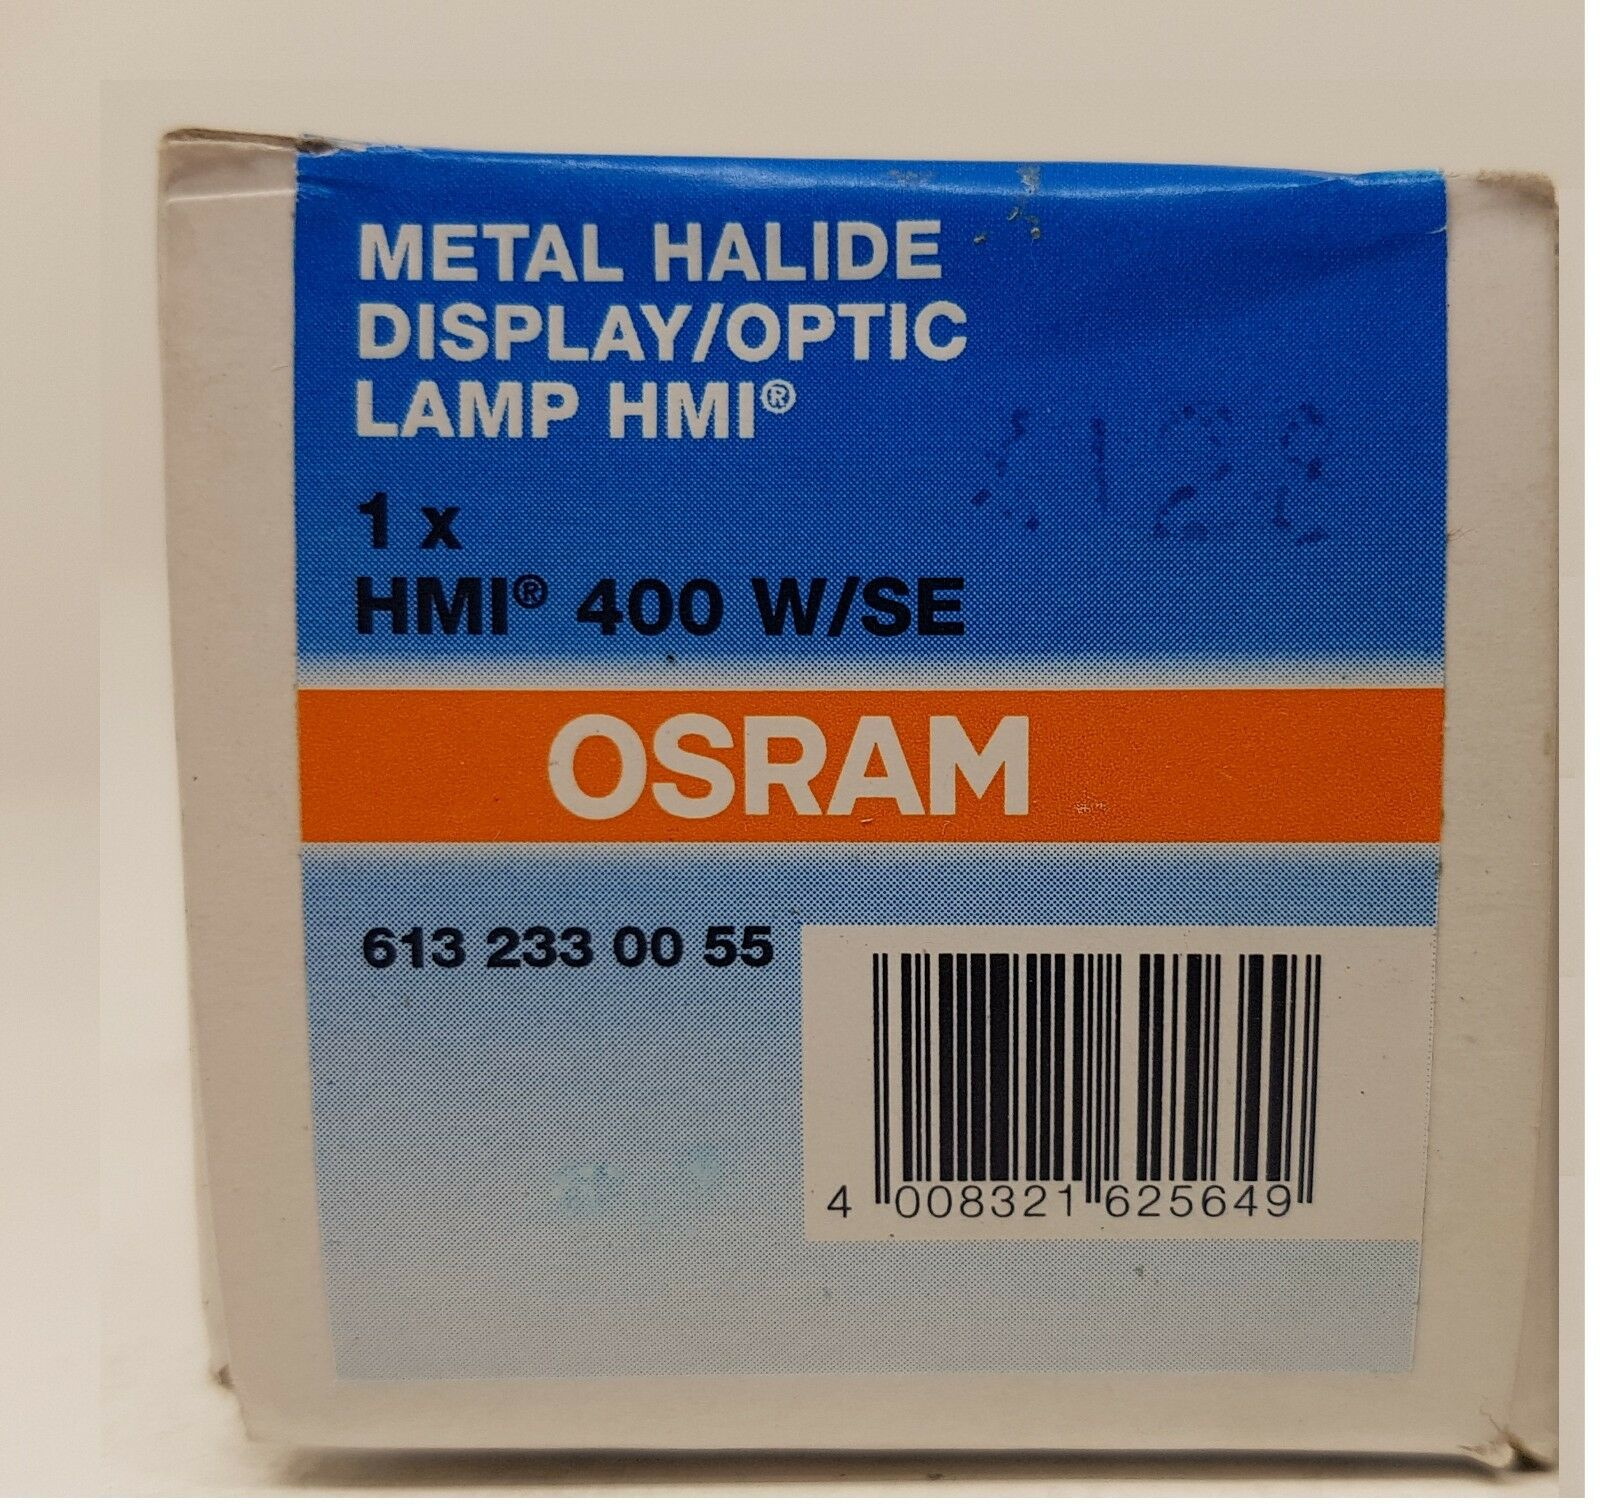 OSRAM HMI 400W SE metal halide display lamp 6000°K GZZ9.5 display halide optic f6da37